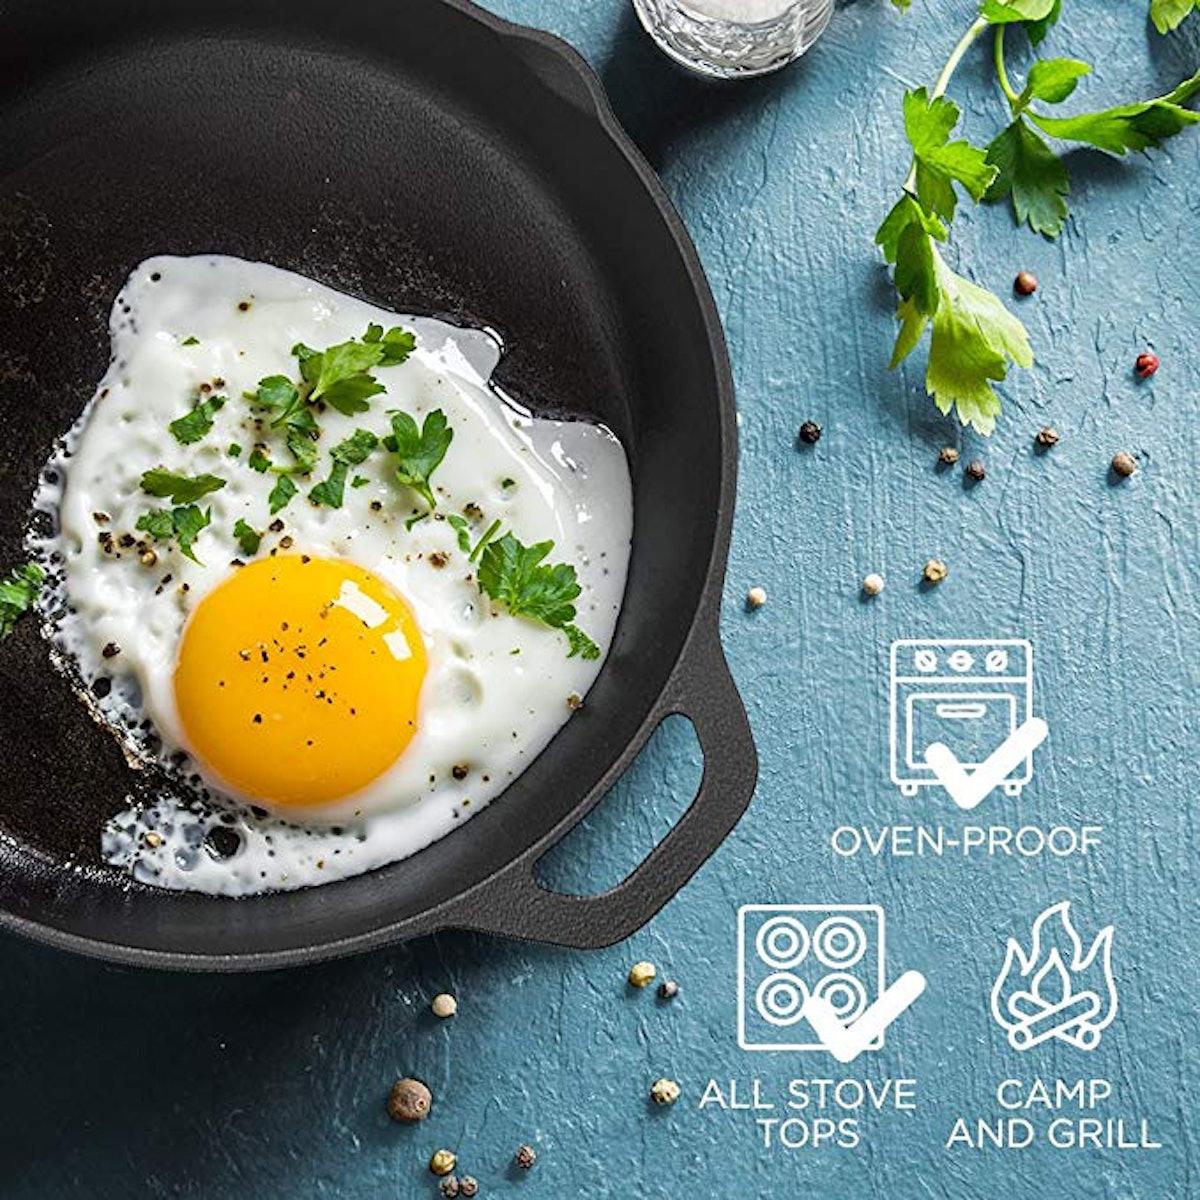 Fresh Australian Kitchen Pre-Seasoned Cast Iron Skillet